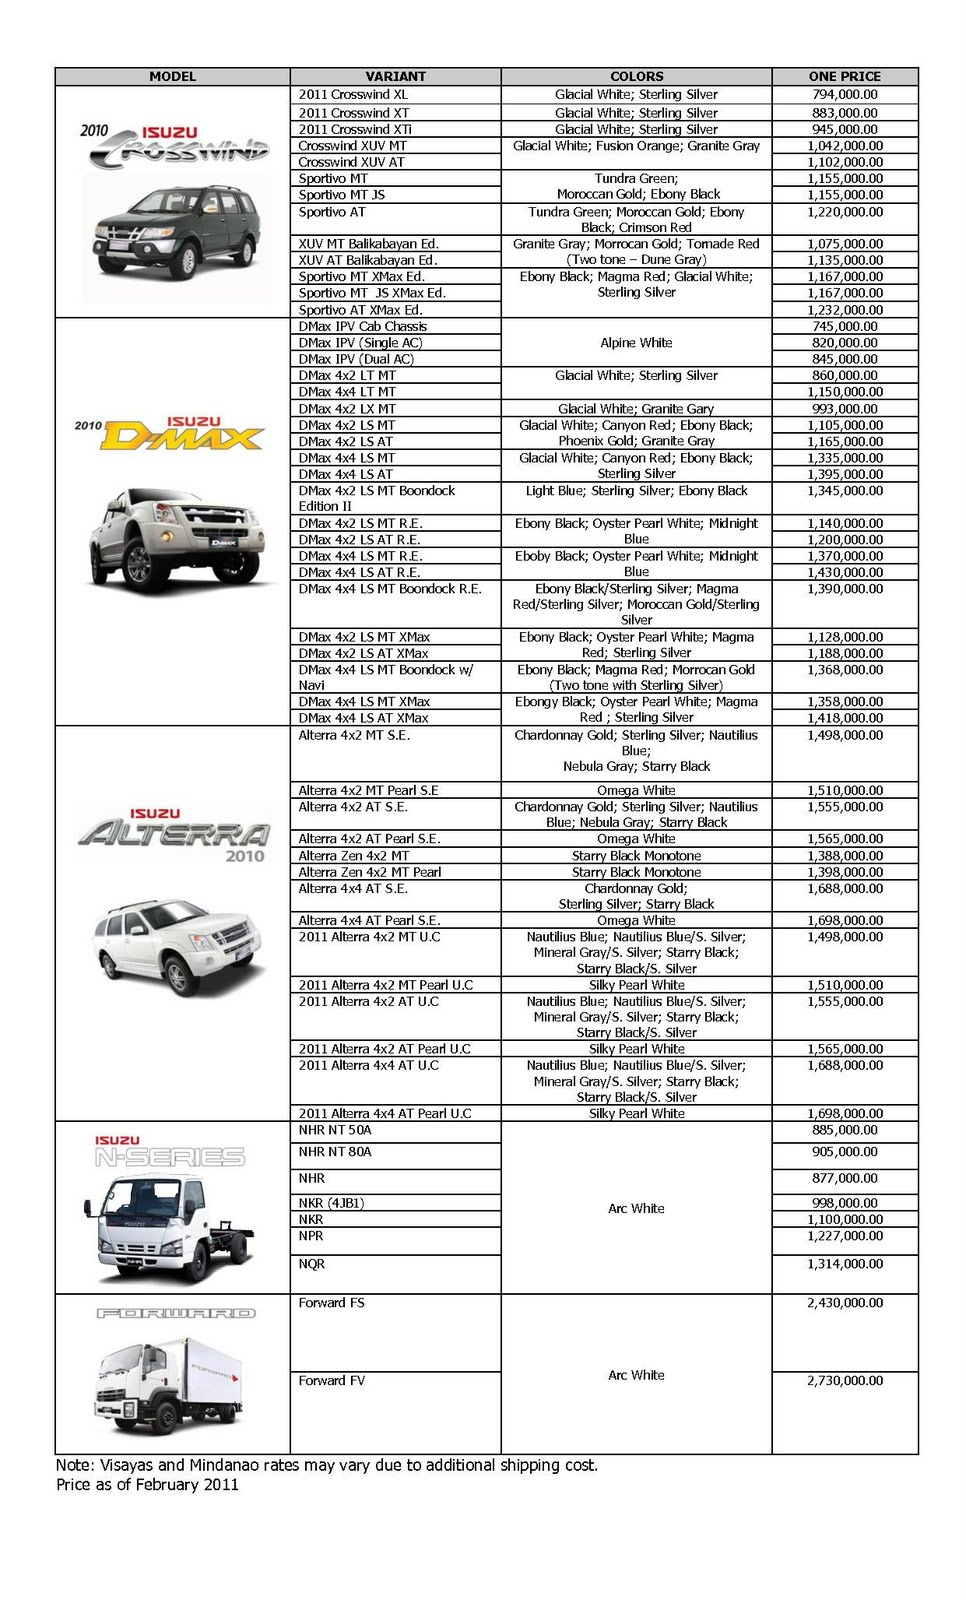 Brand New Cars For Sale Isuzu Pricelist